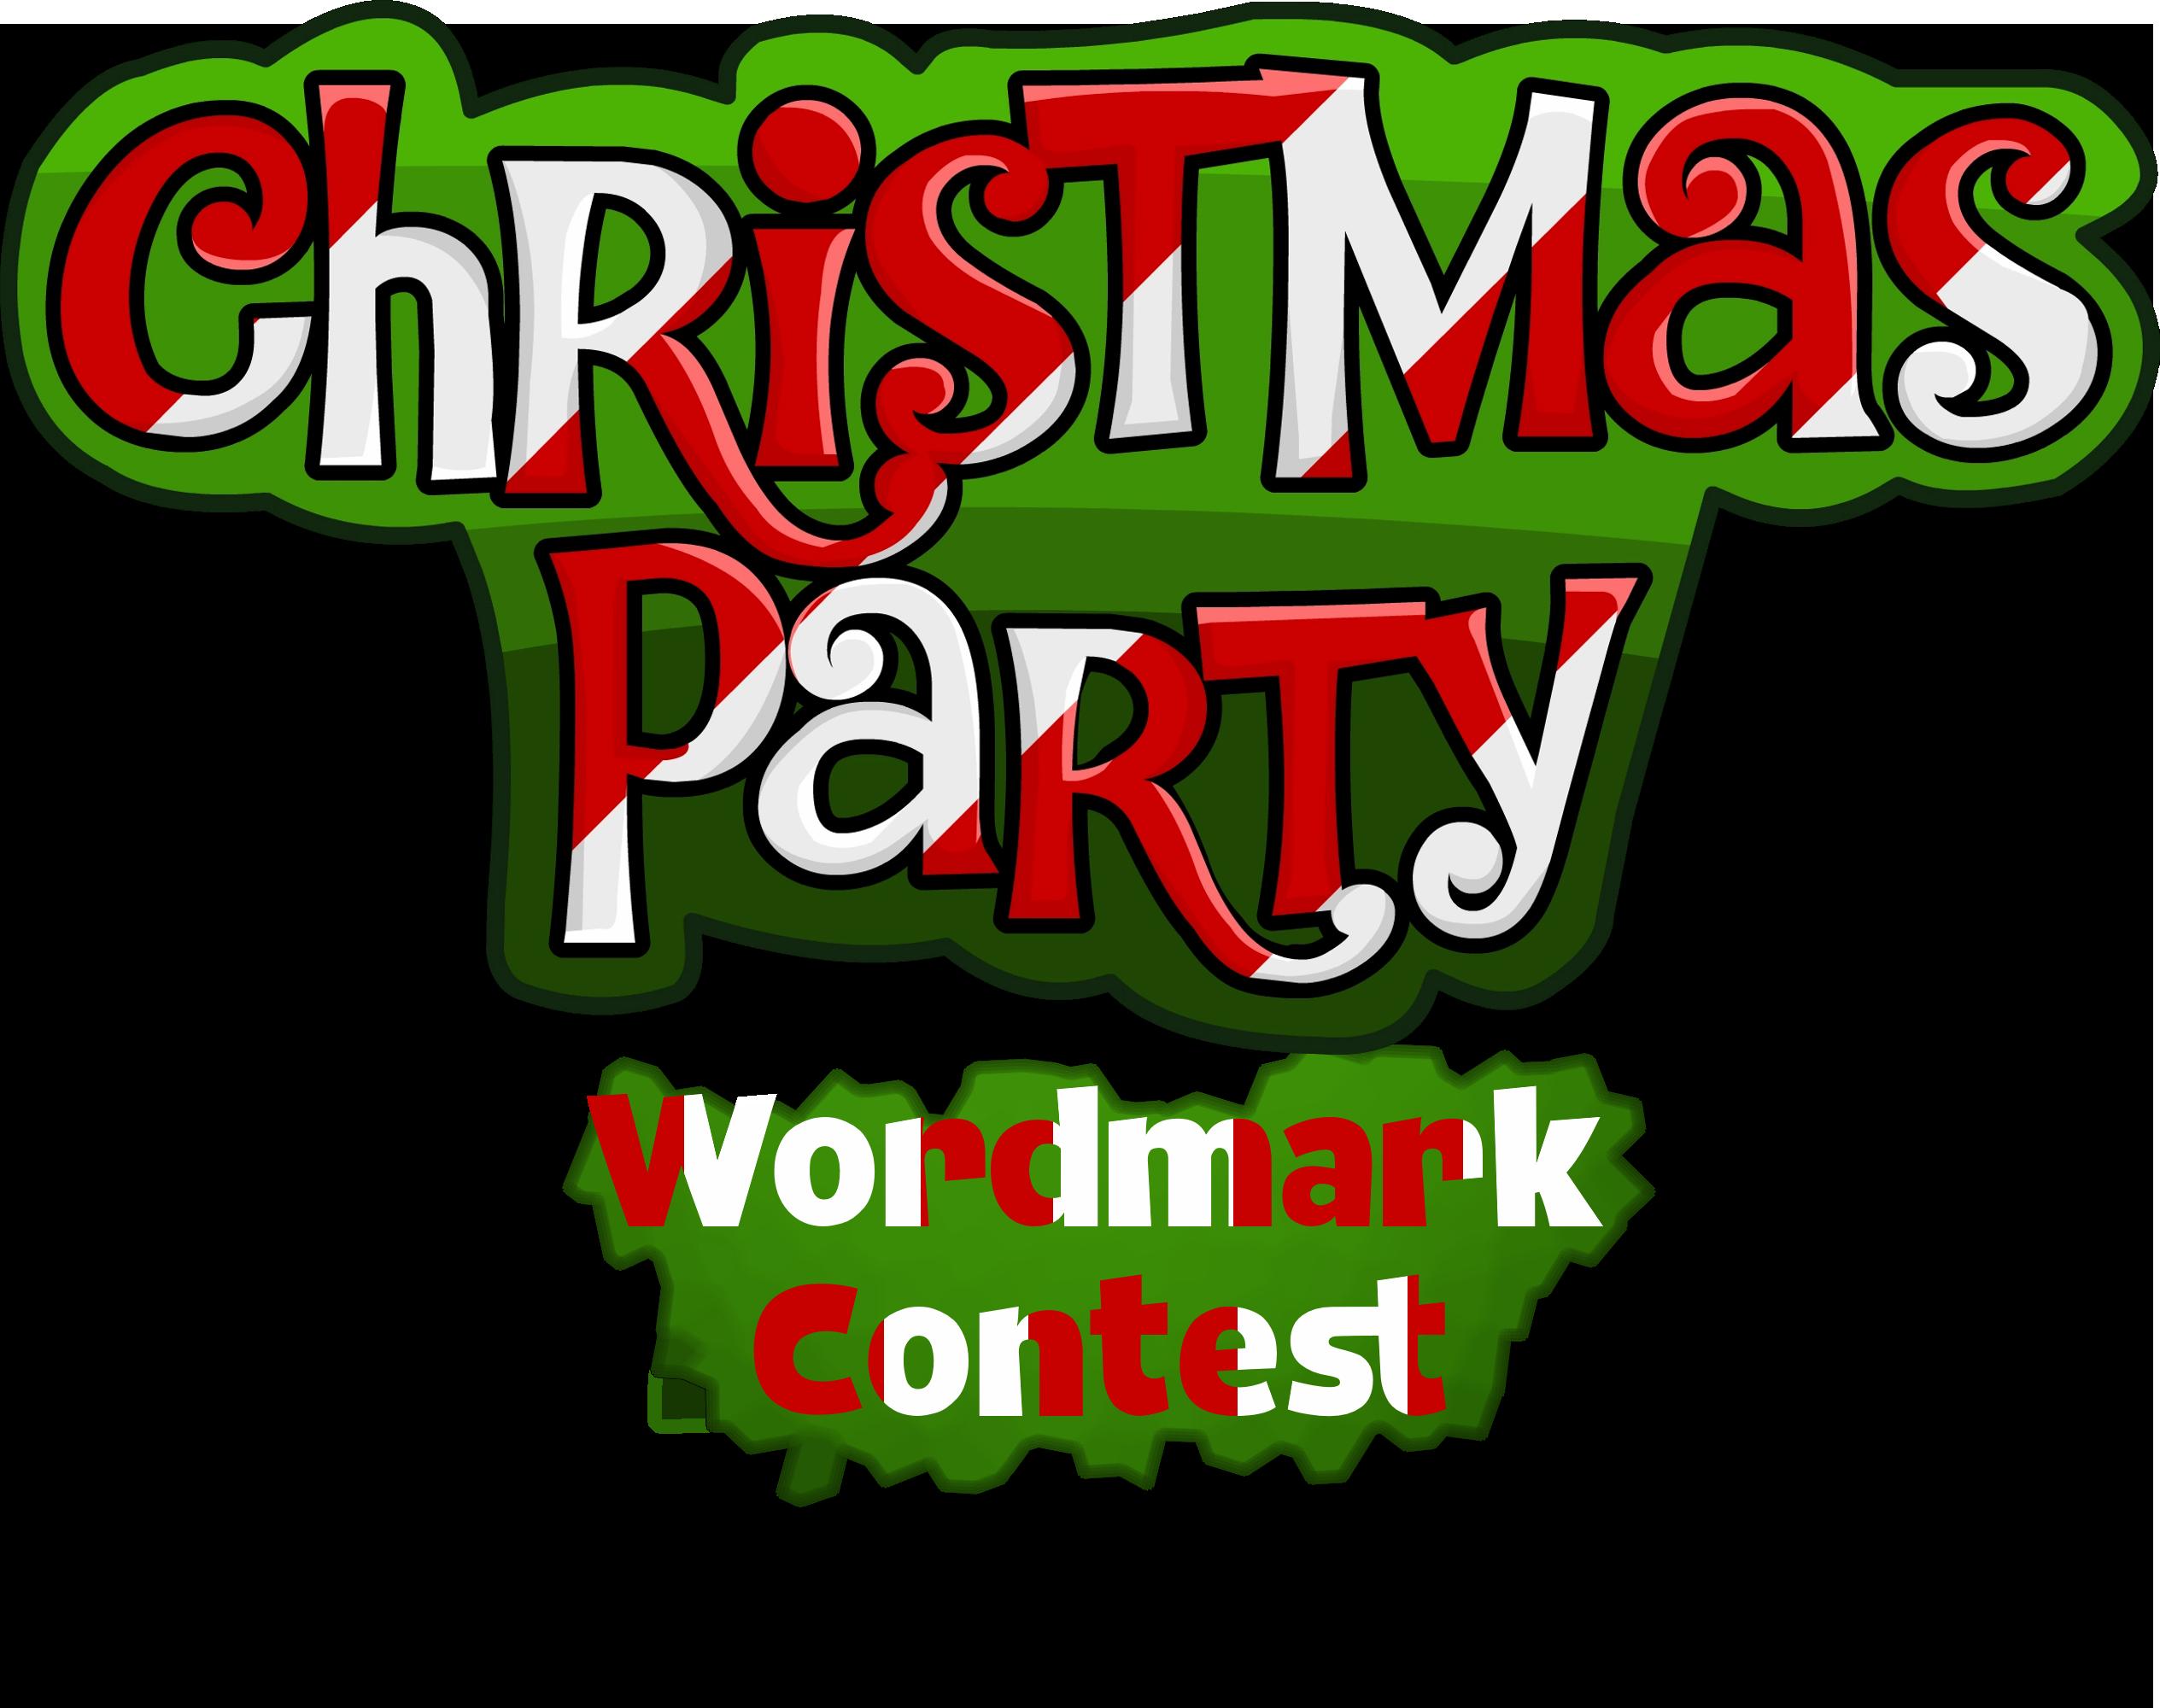 Lataus/Christmas Party 2018 Wordmark Contest!